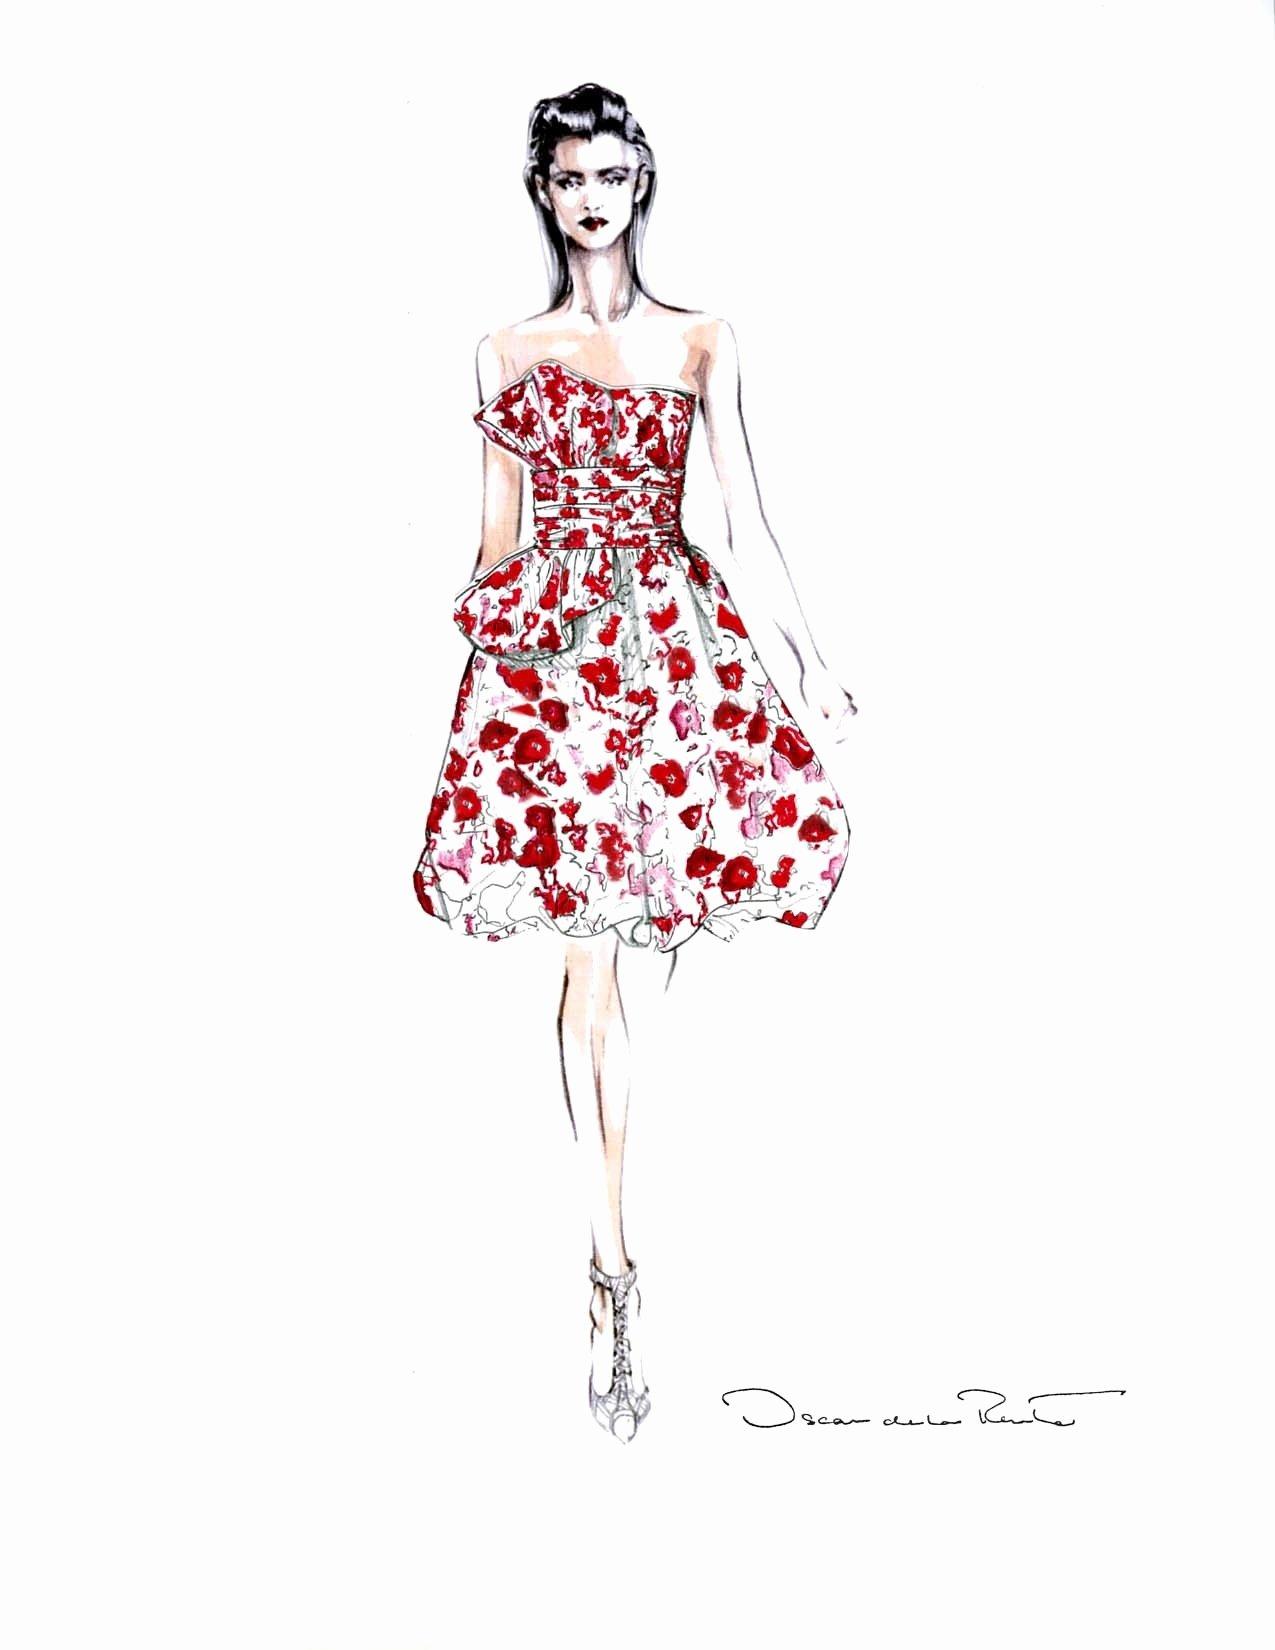 Dress Sketches for Fashion Designing Beautiful Oscar De La Renta Fashion Sketches